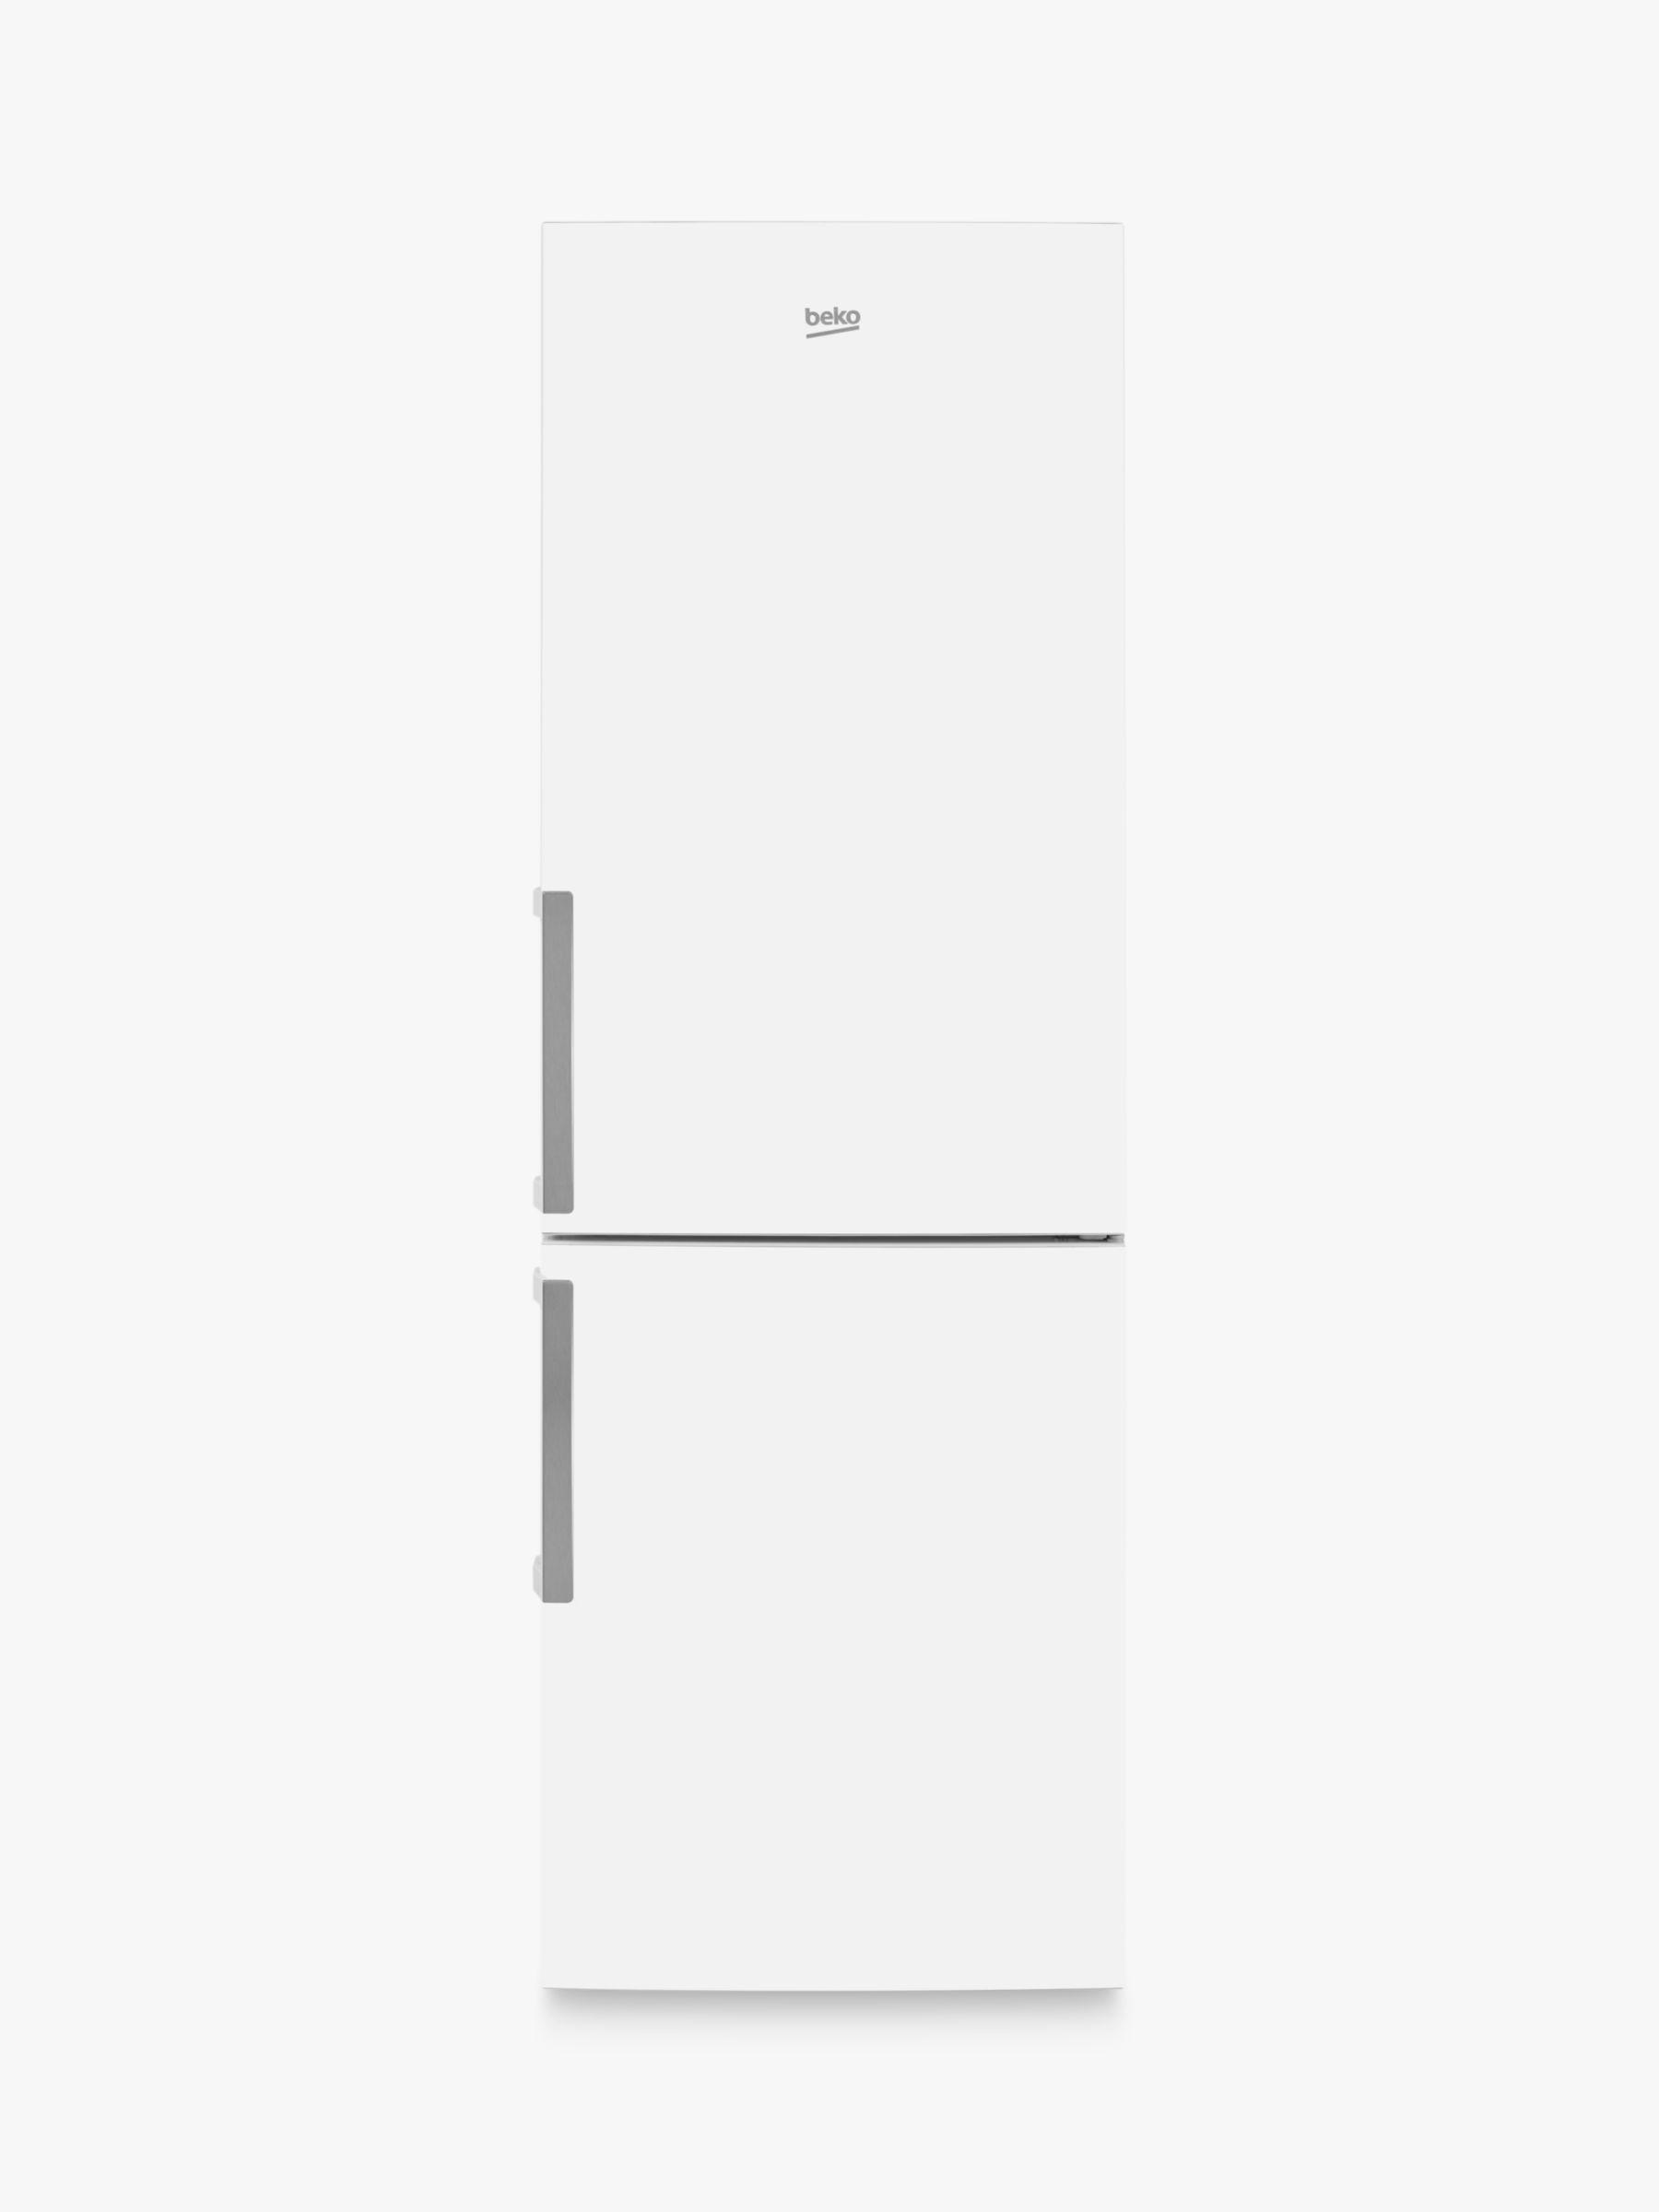 Beko Beko CFP1685W Freestanding Fridge Freezer, A+ Energy Rating, 60cm Wide, White